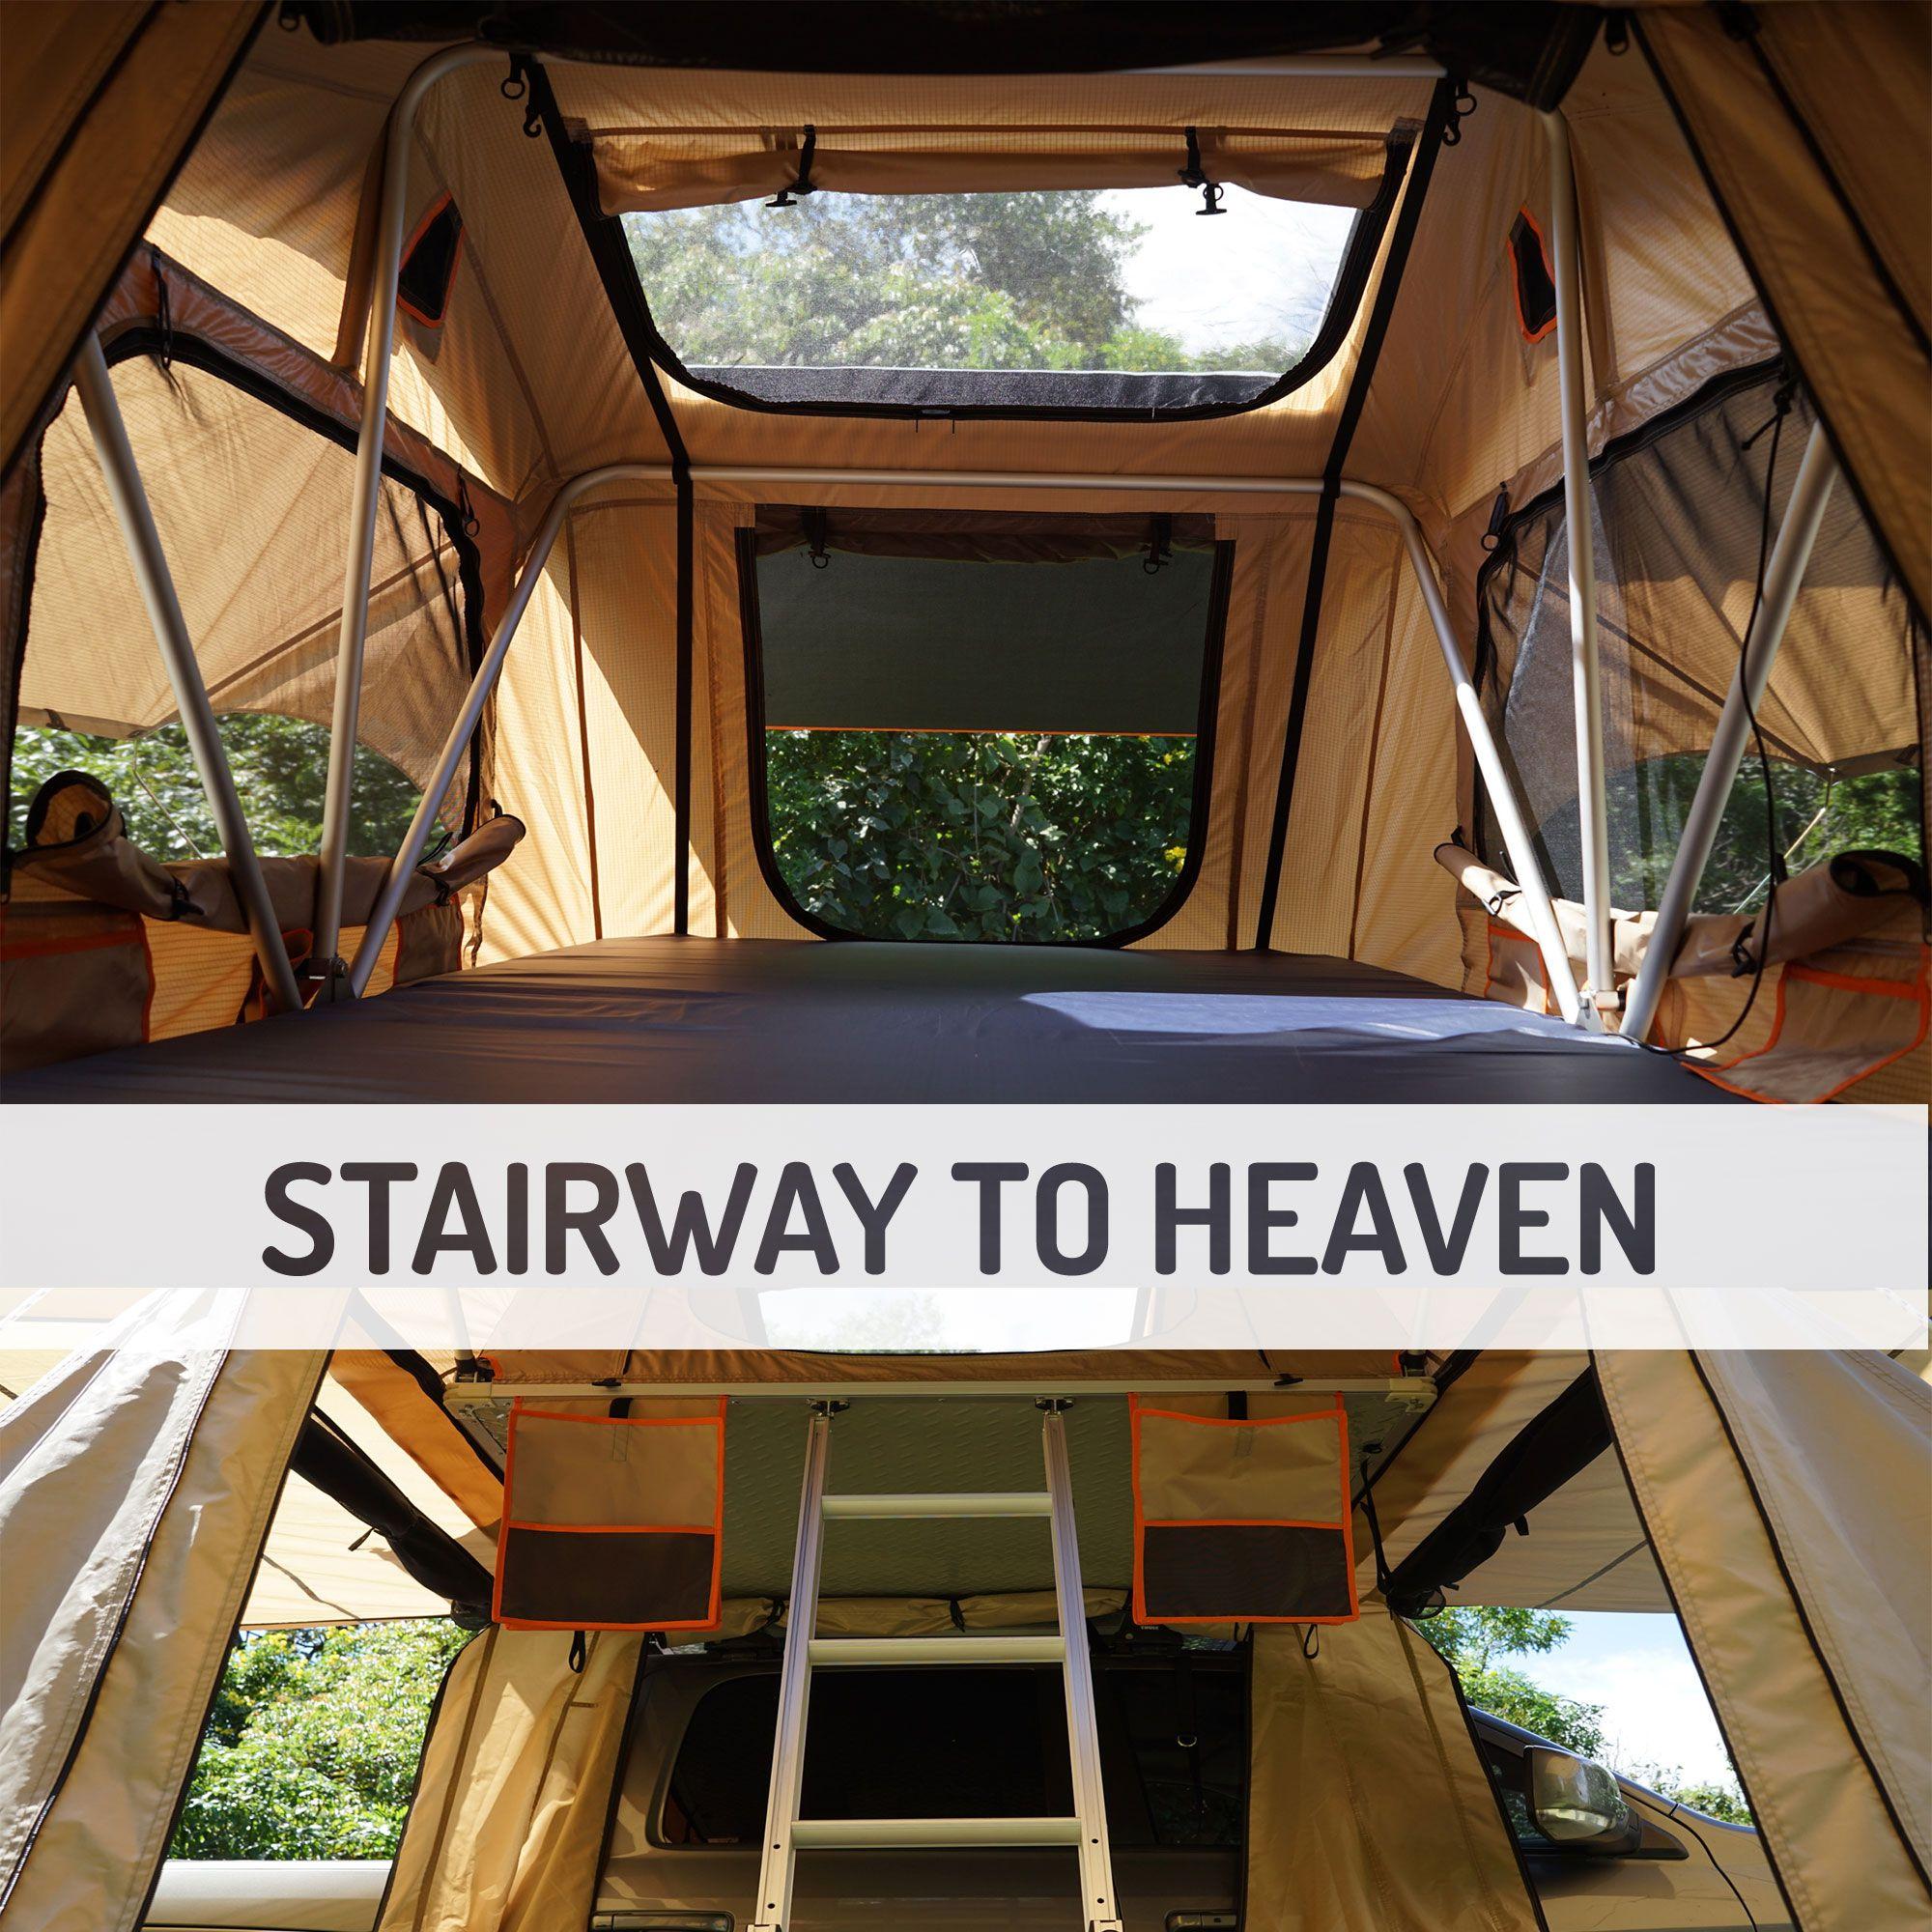 Guana Equipment Wanaka 55 Roof Top Tent Setup With Xl Annex 3 Person Roof Top Tent Rooftop Tent Camping Top Tents